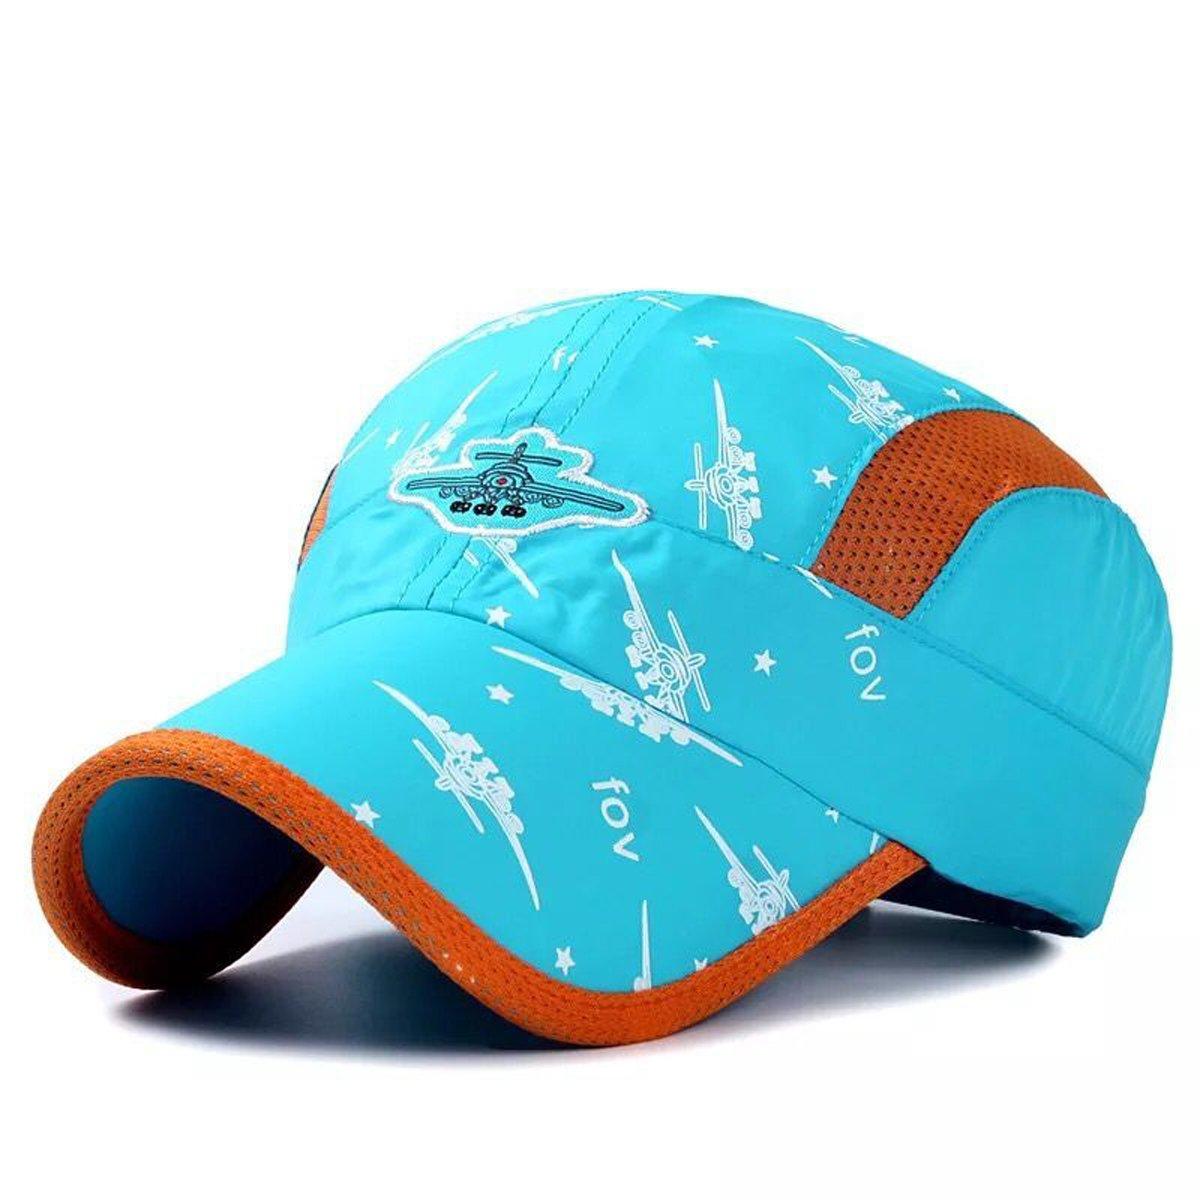 JOYEBUY Kids Girl Boy Lightweight Quick Drying Sun Hat Summer UV Protection Baseball Cap (Sky Blue)